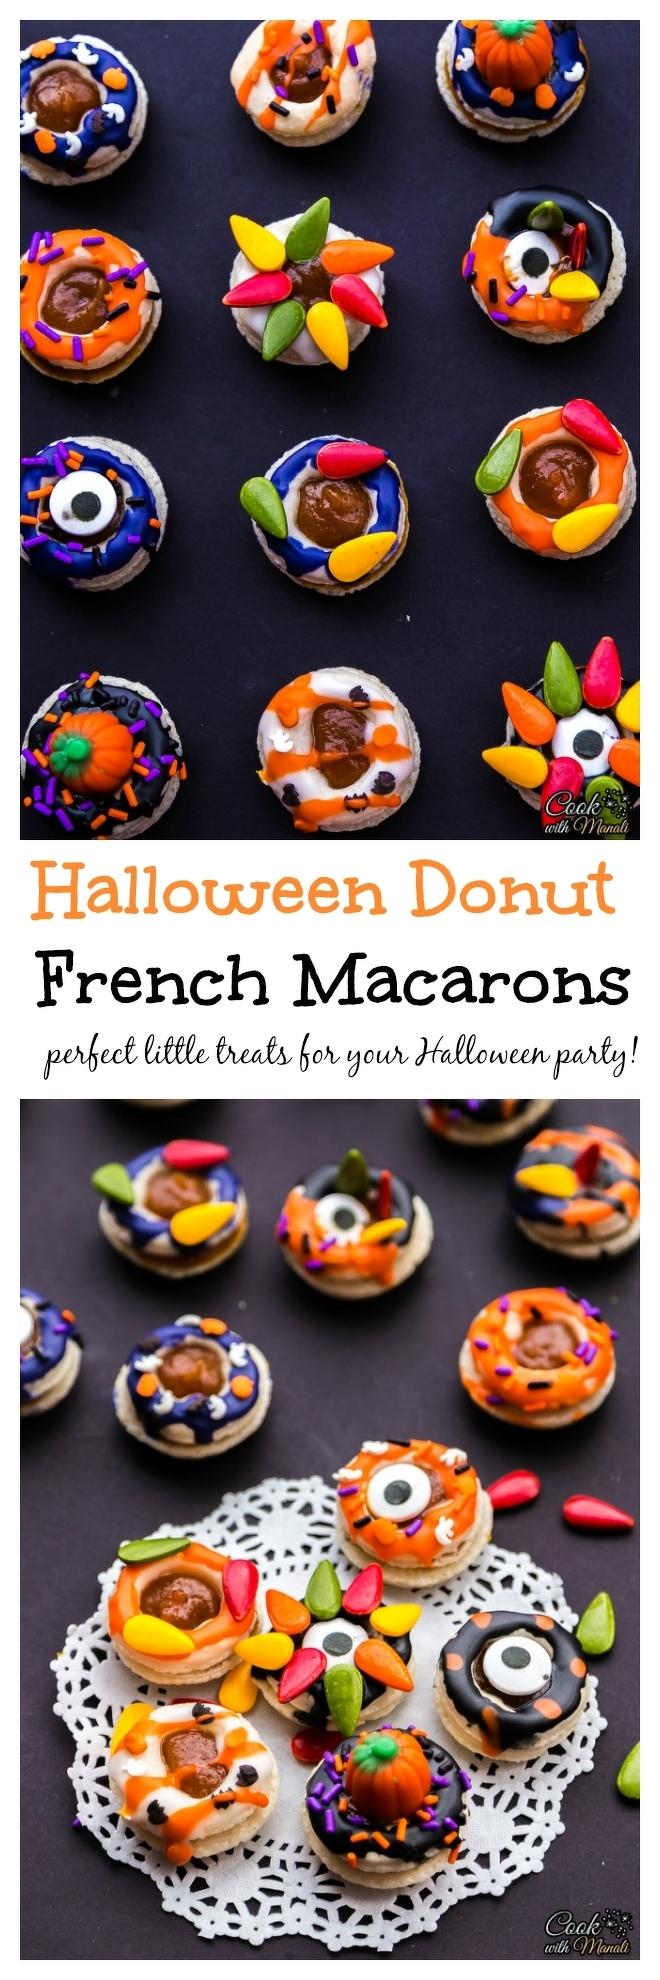 Halloween-Donut-Macarons Collage-nocwm